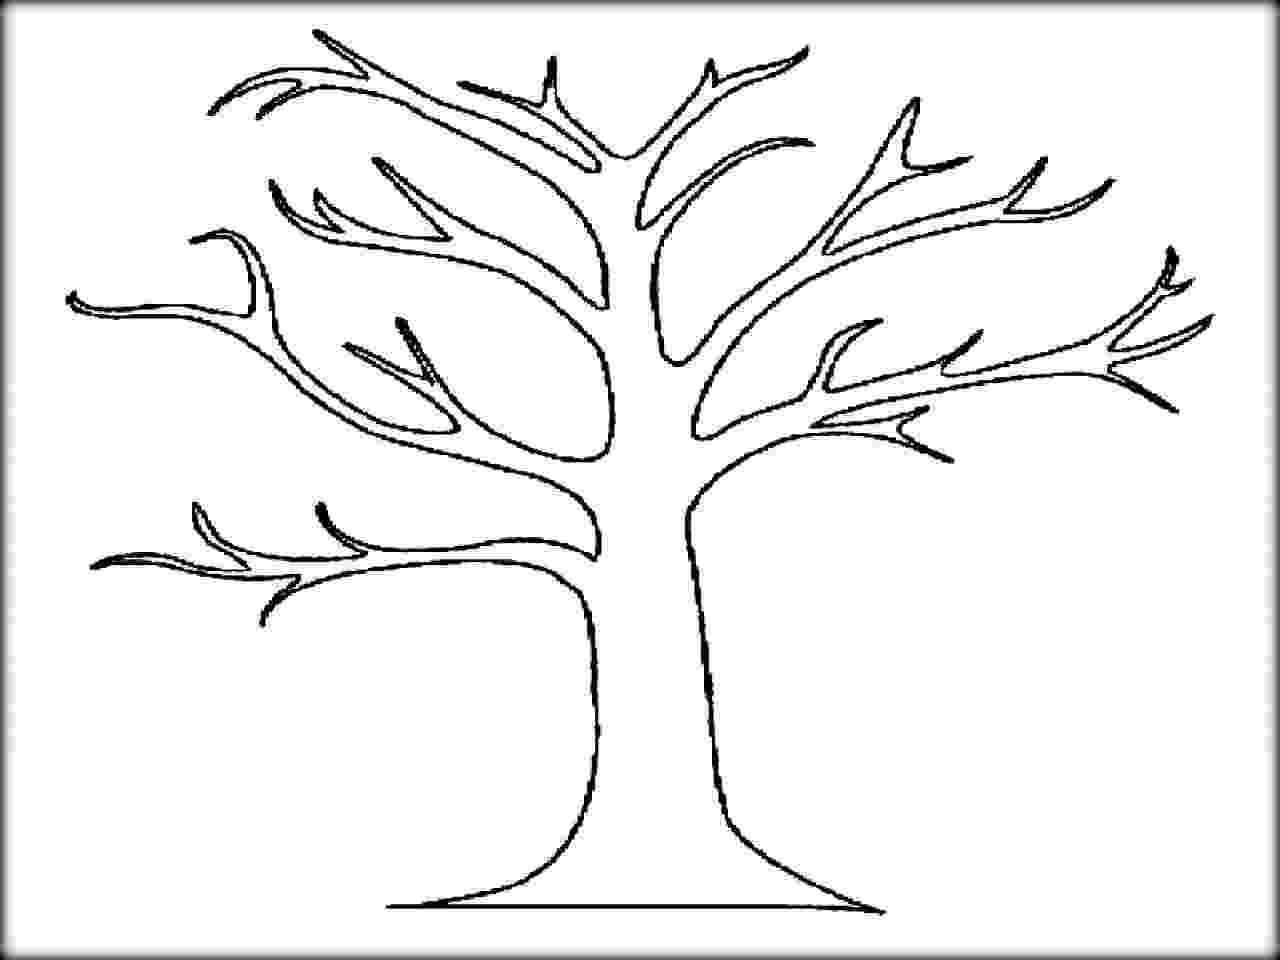 fall tree coloring sheet autumn trees drawing at getdrawingscom free for sheet coloring tree fall